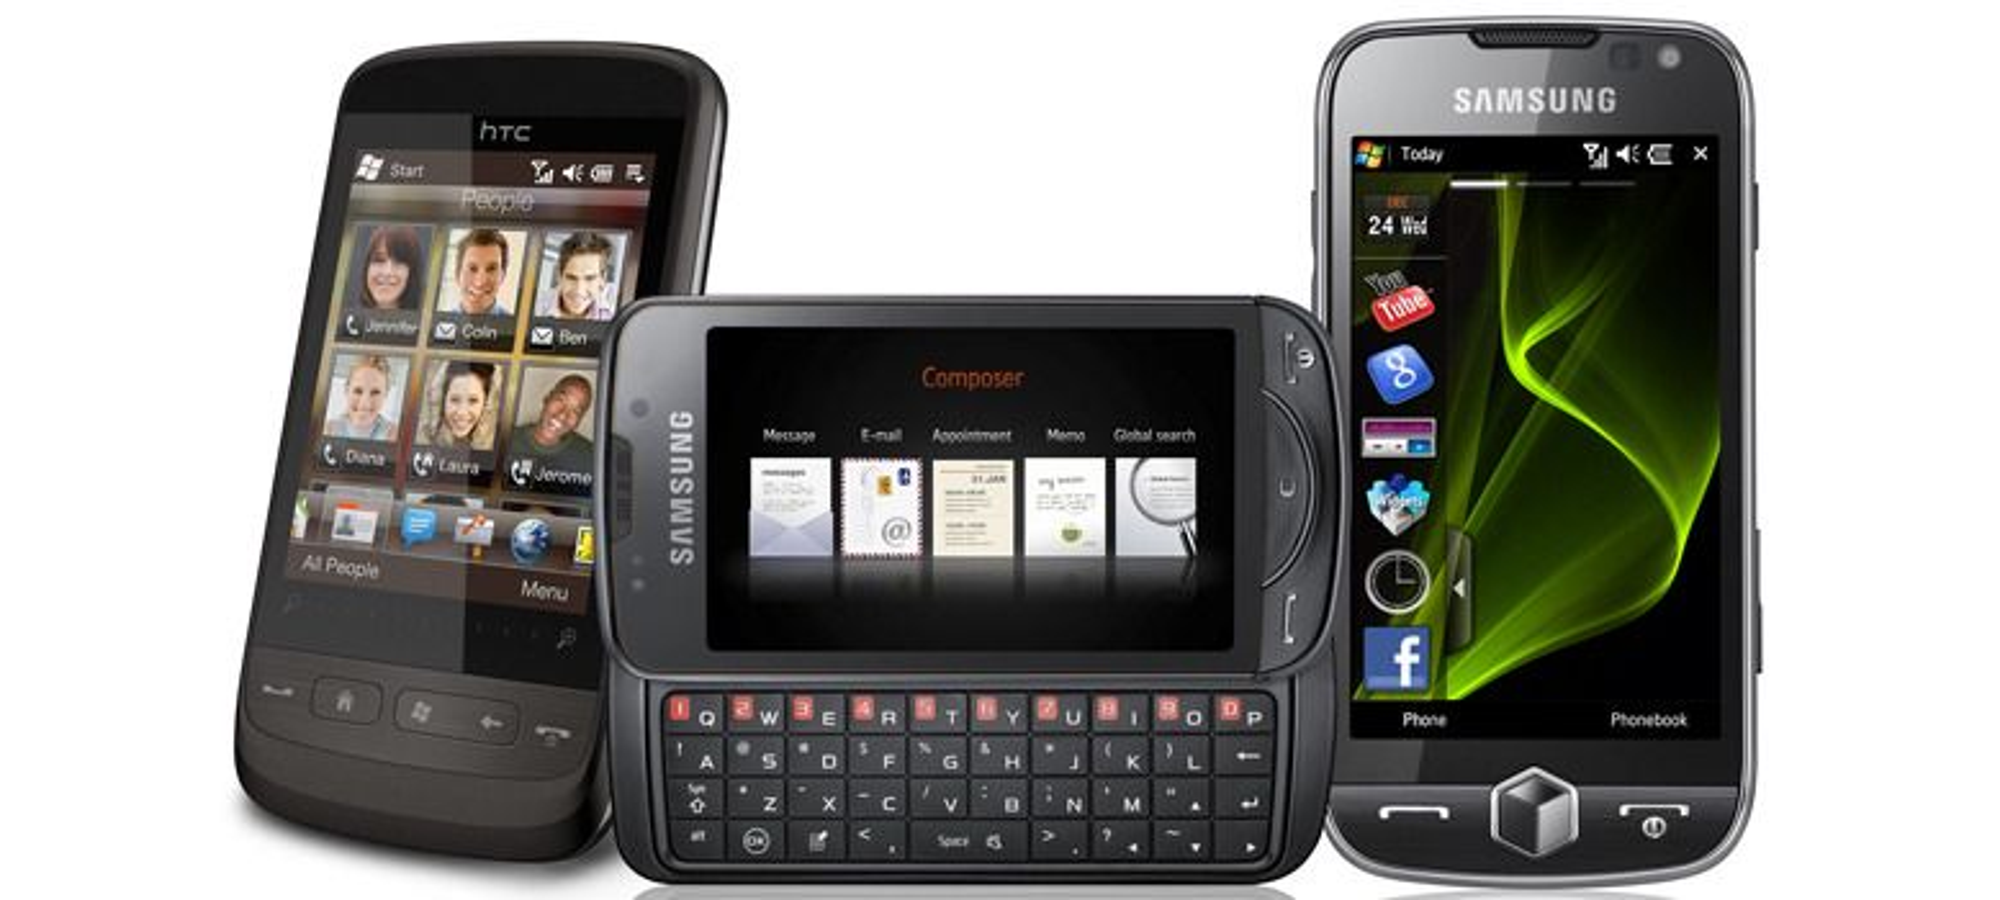 Disse kommer med Windows Mobile 6.5